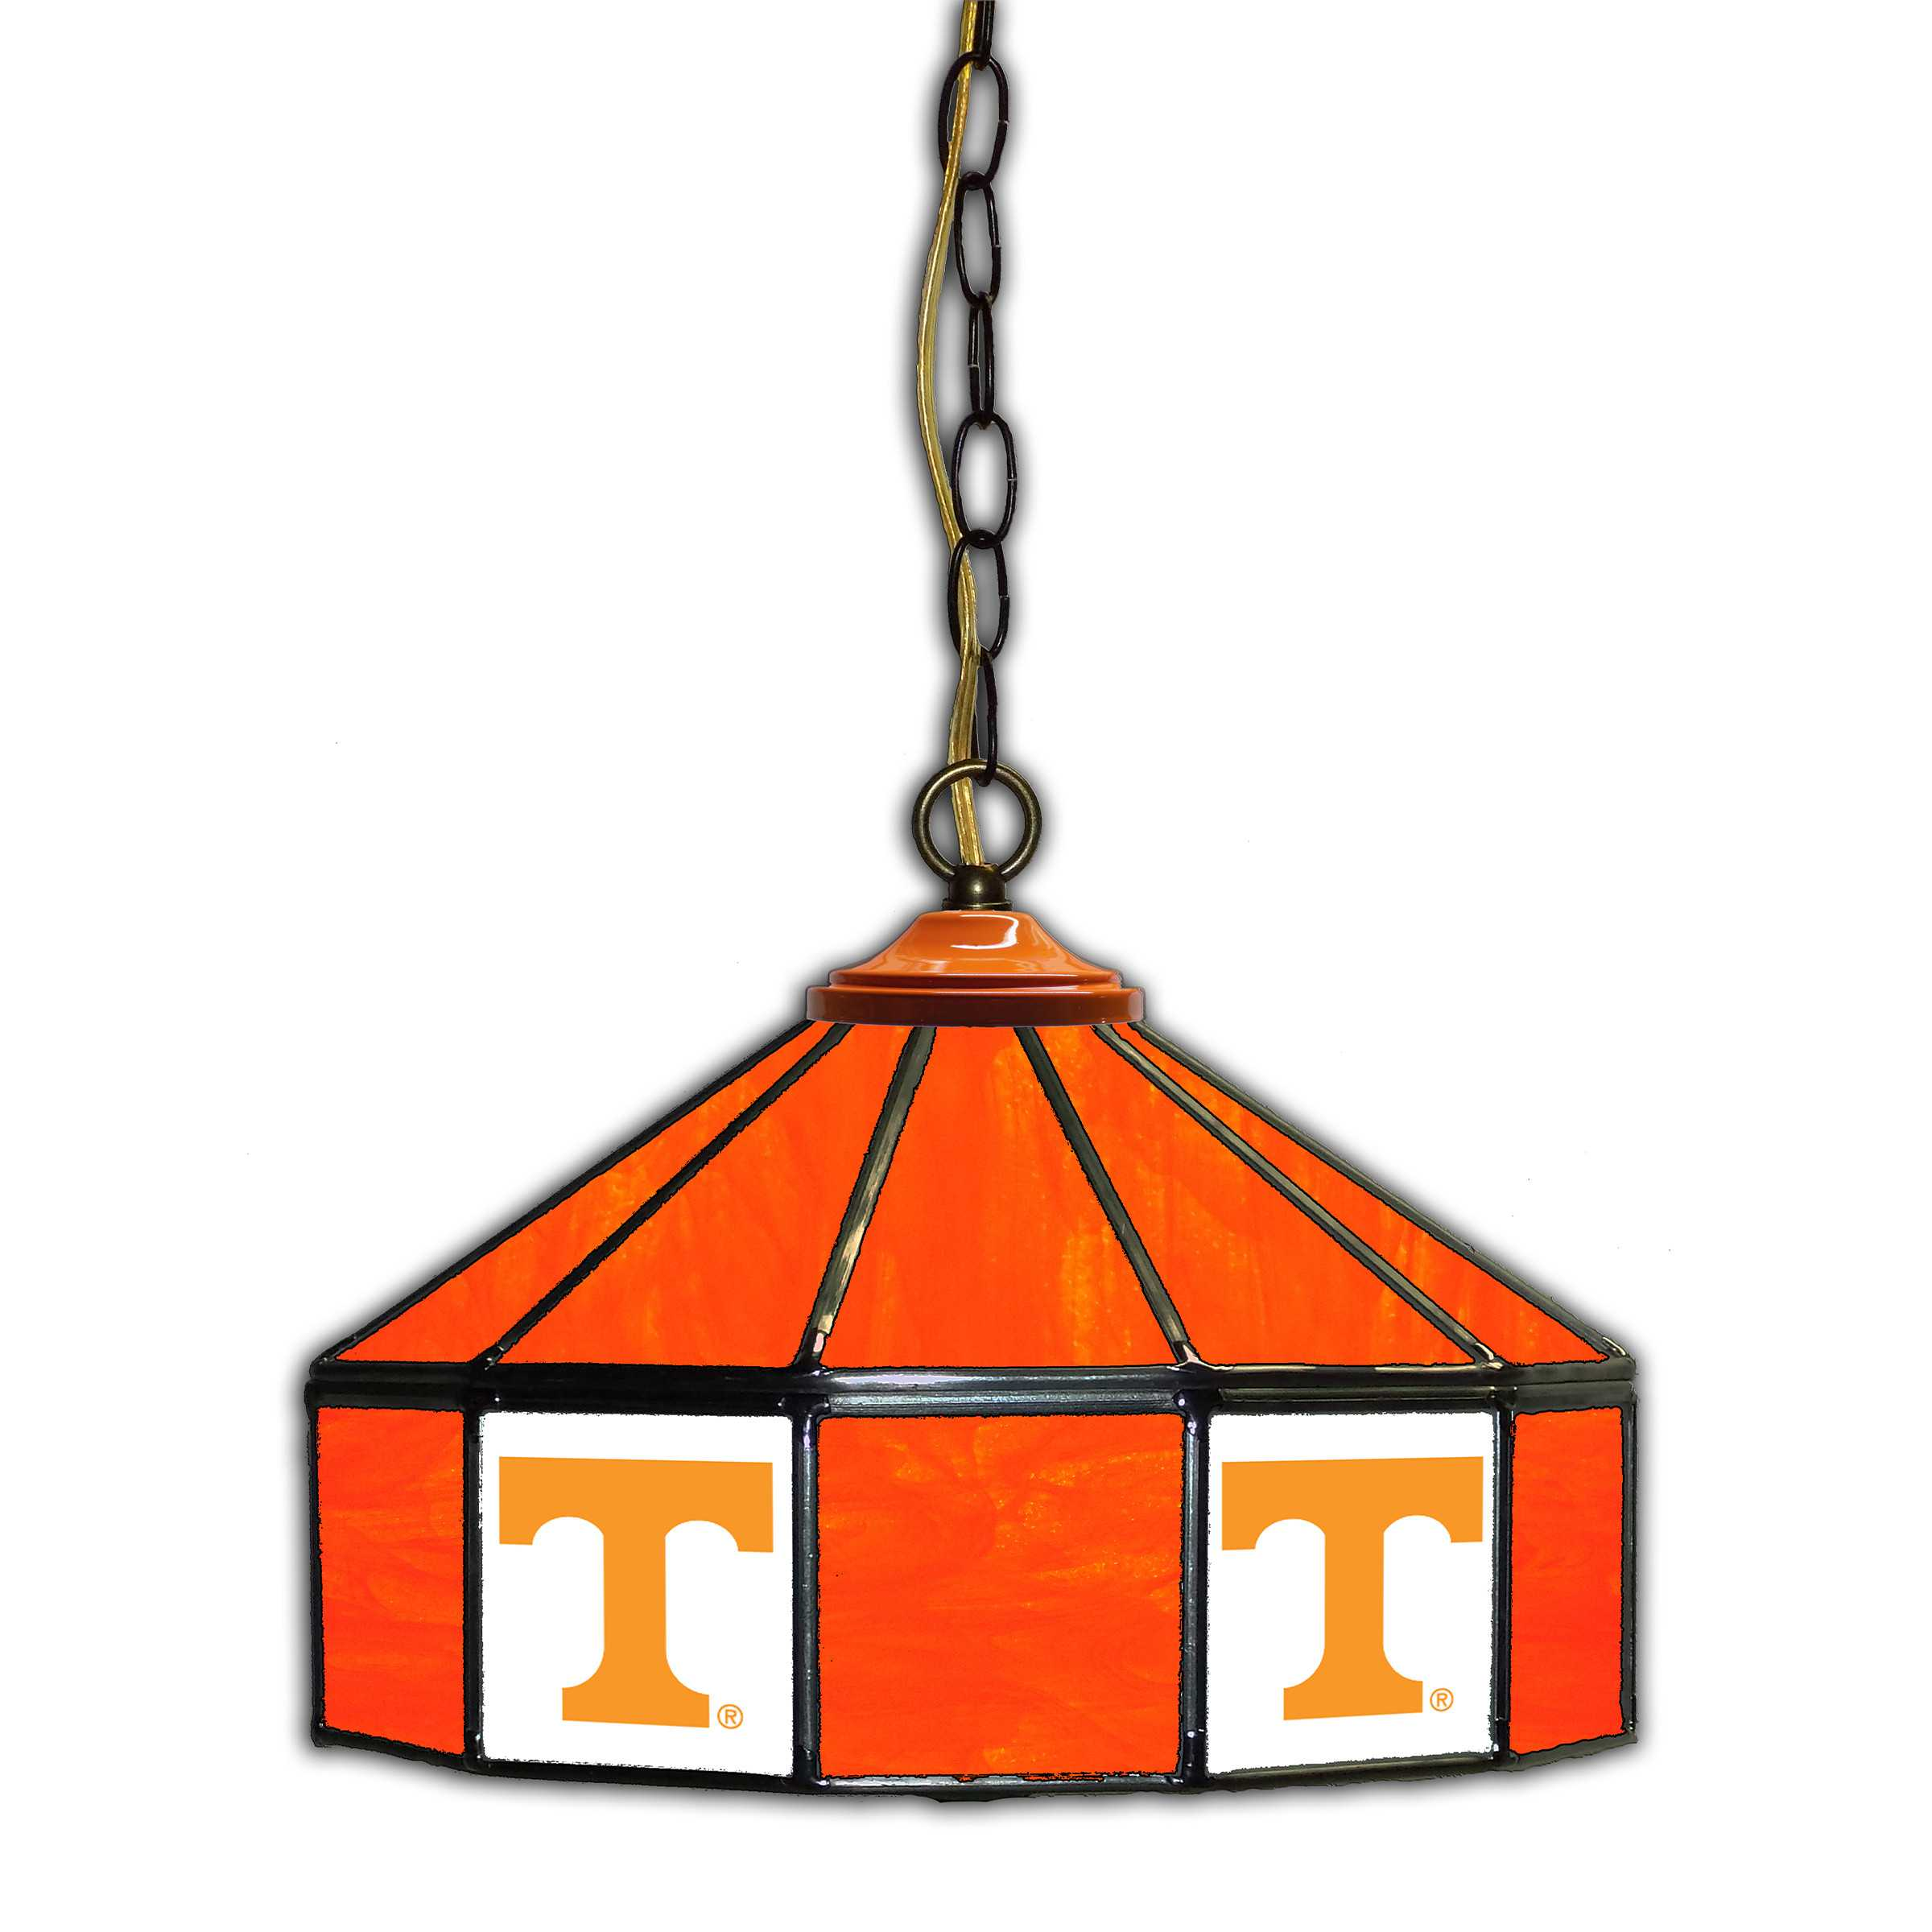 "UNIVERSITY OF TENNESSEE 14"" GLASS PUB LAMP"